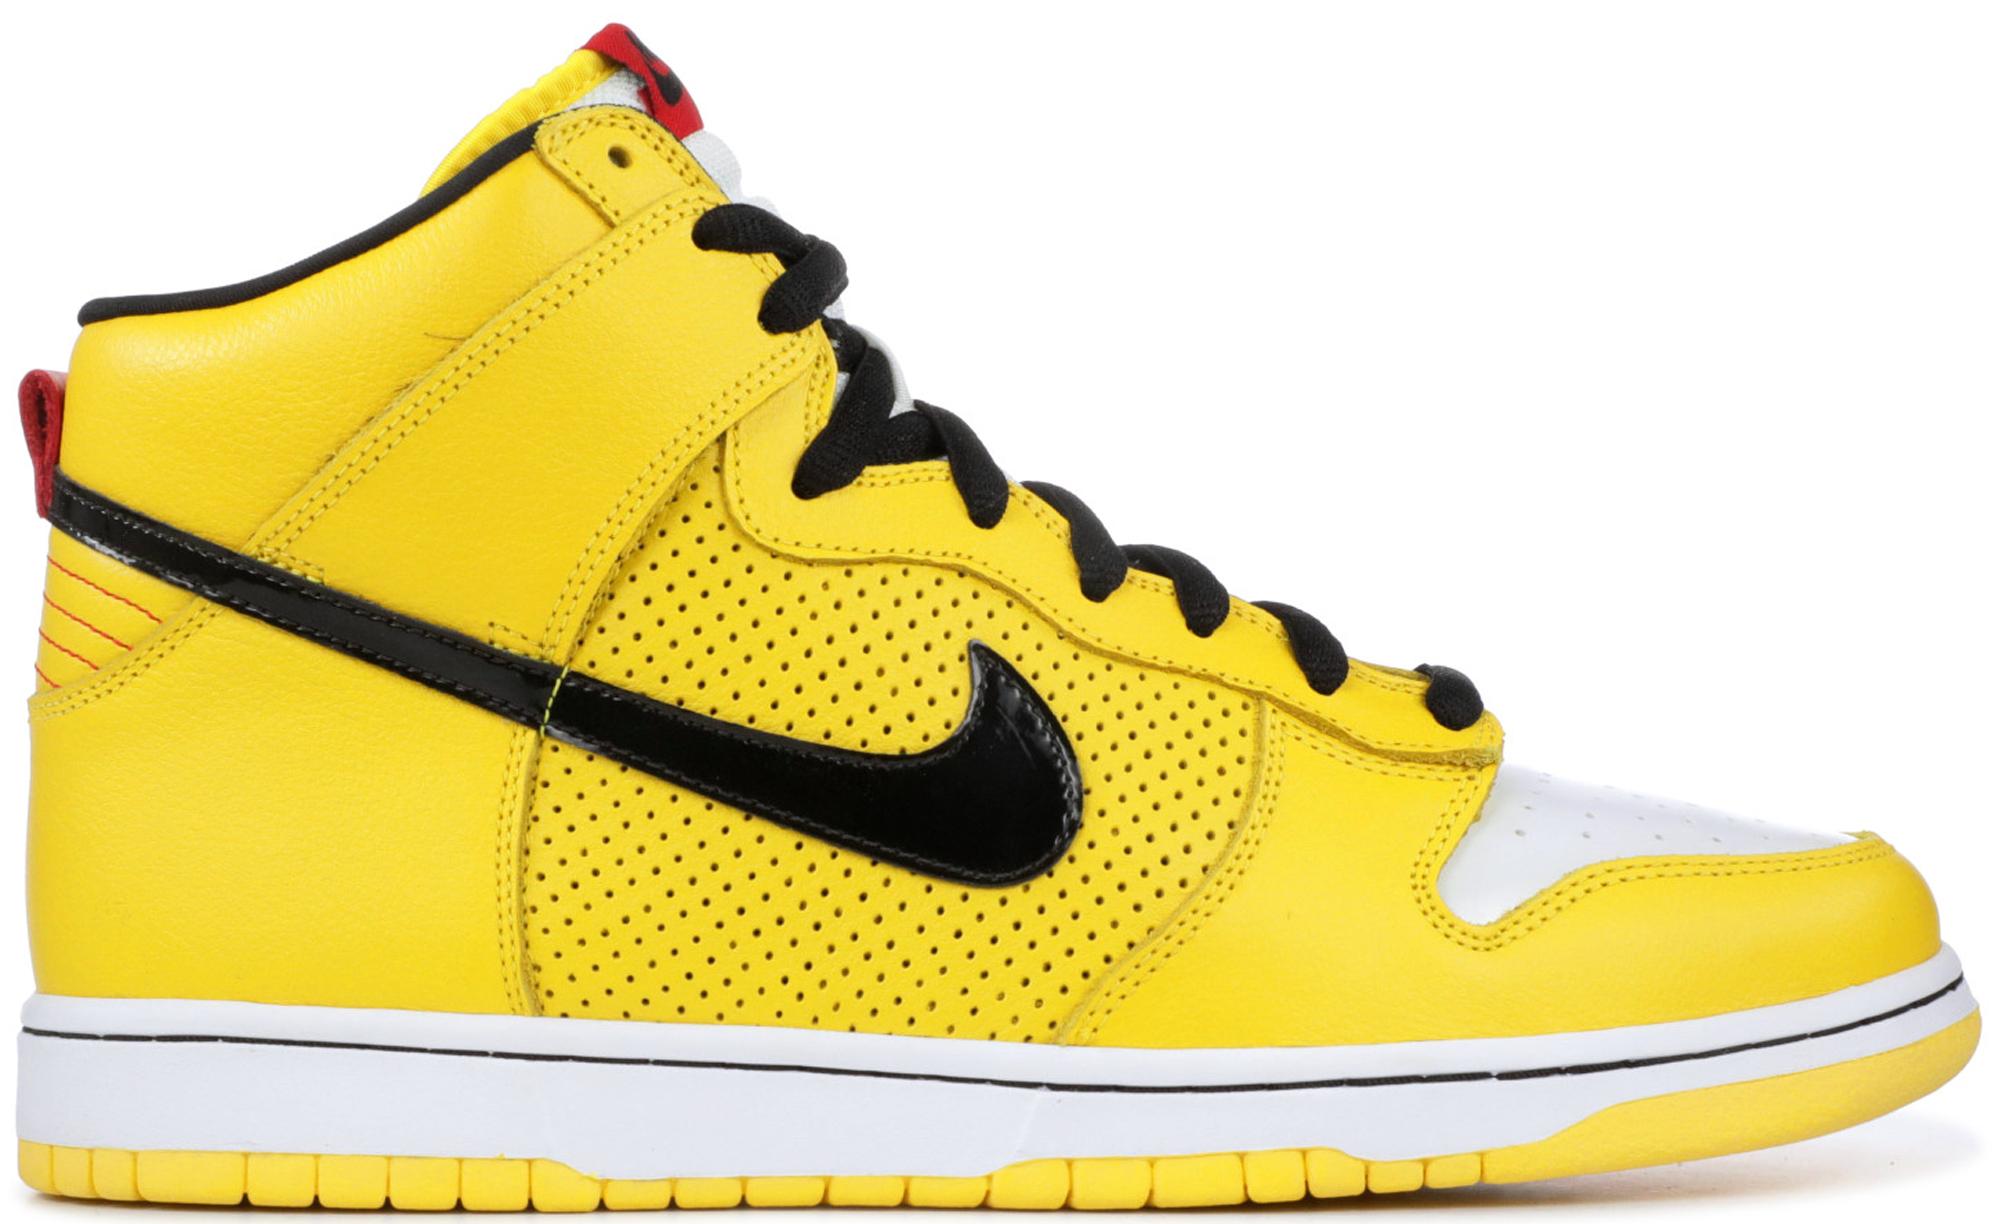 Nike SB Dunk High Wet Floor - 313171-701